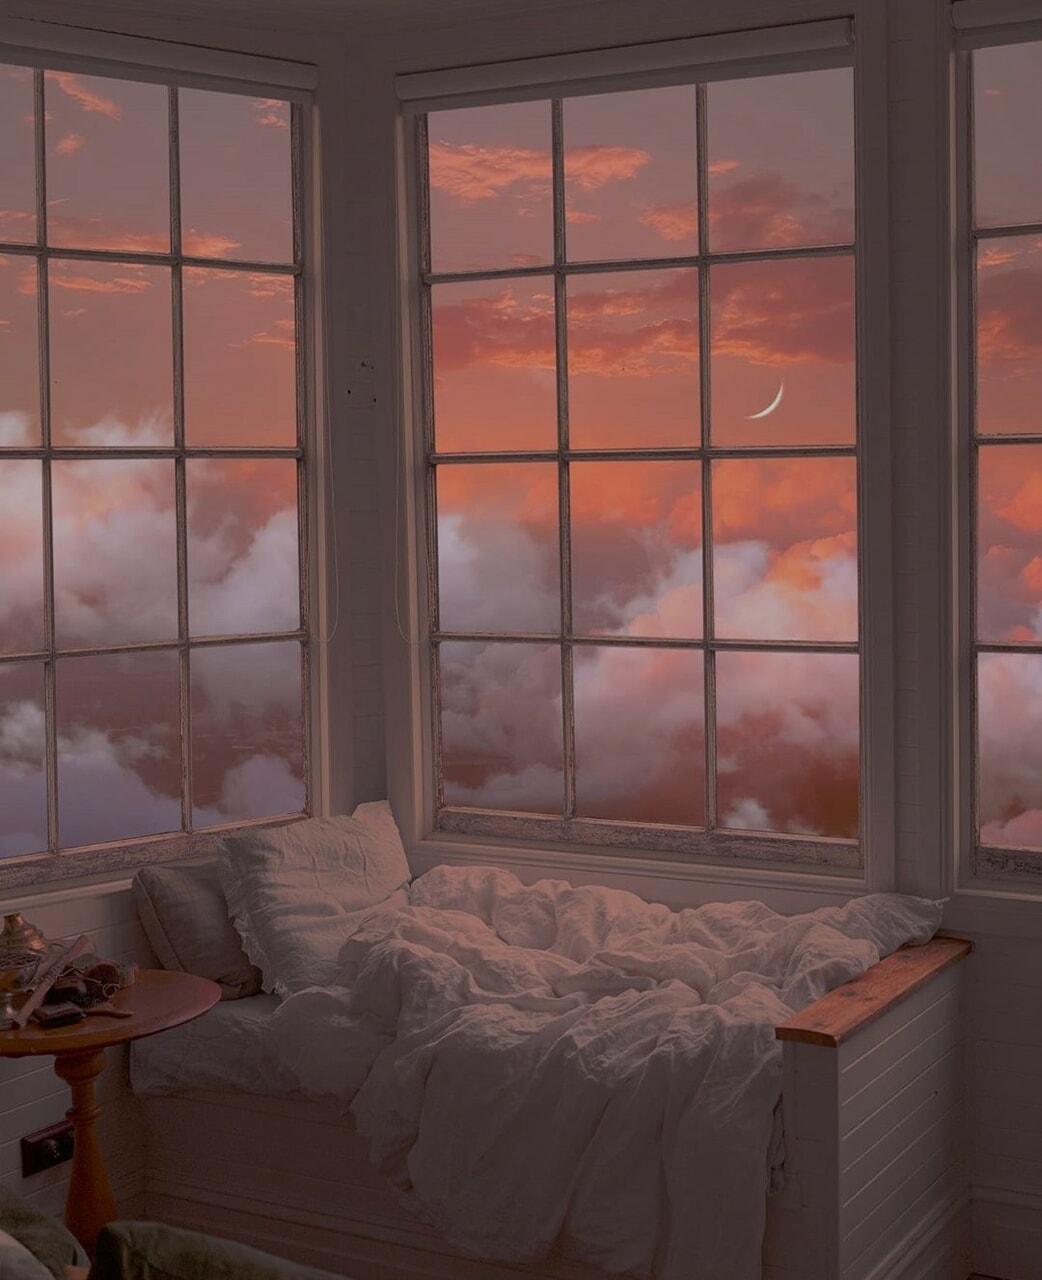 article, meditation, and rain sounds image